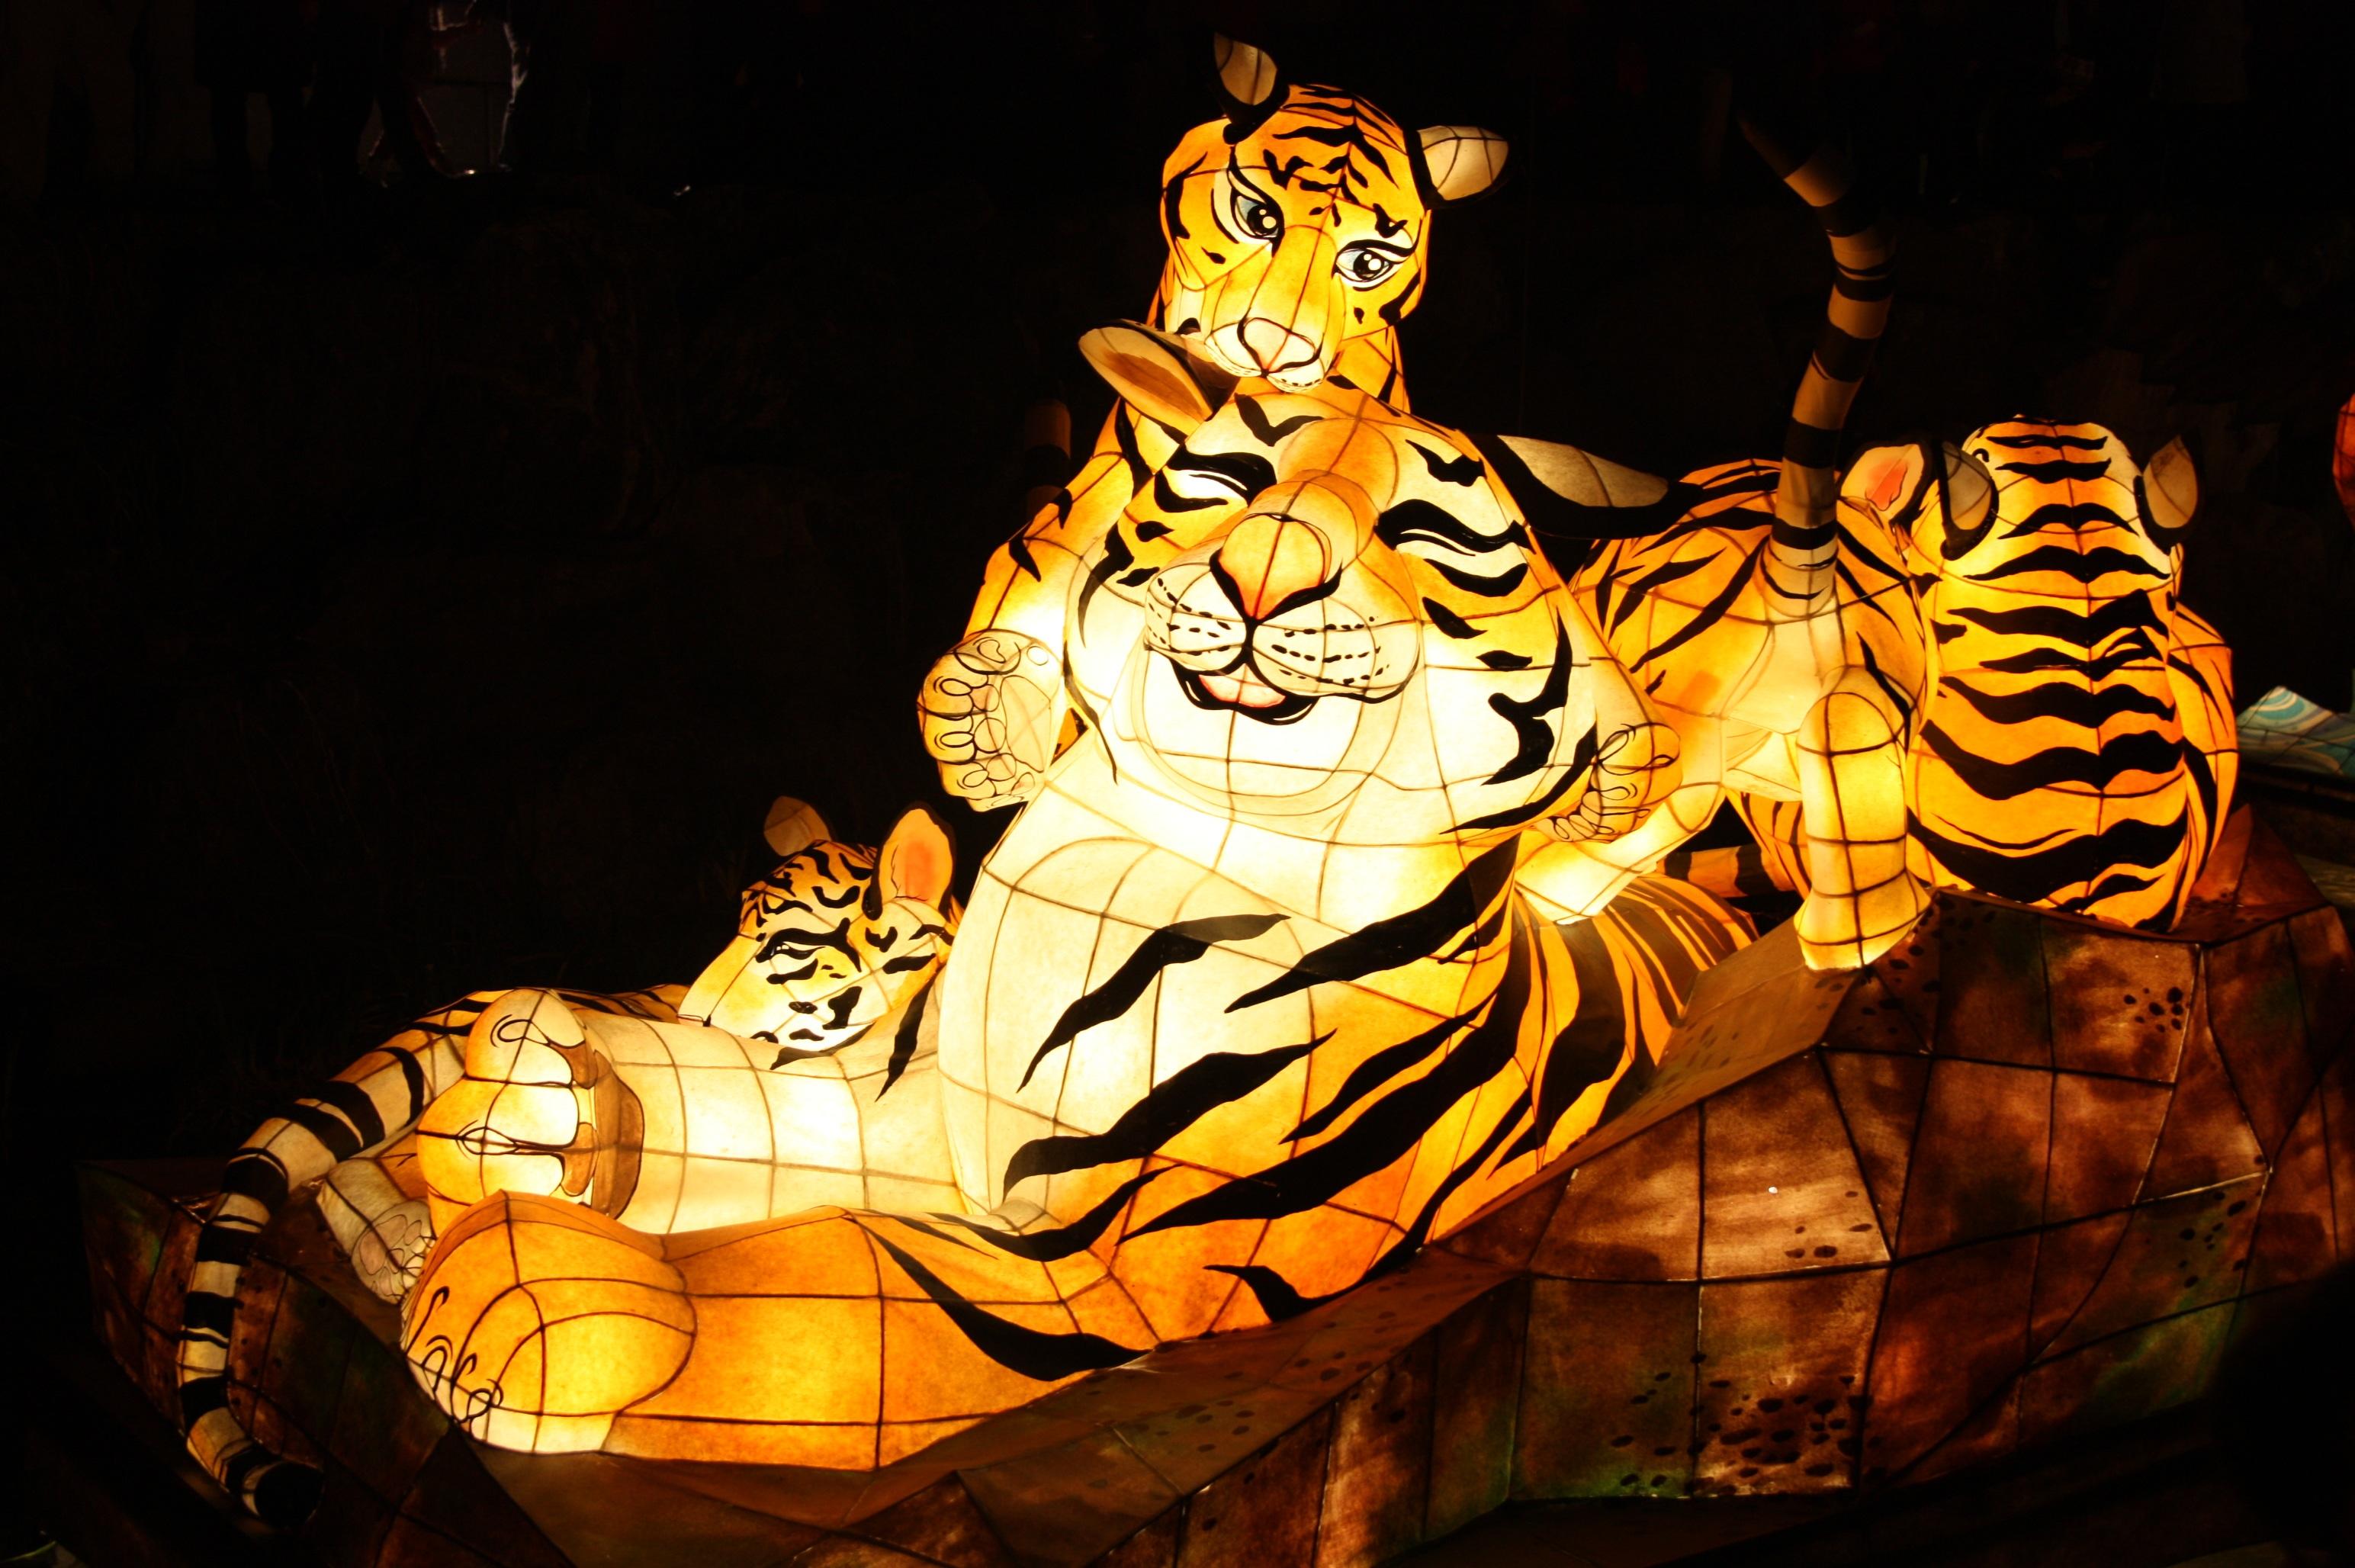 Free Images Night Amut Park Lighting Art Tiger